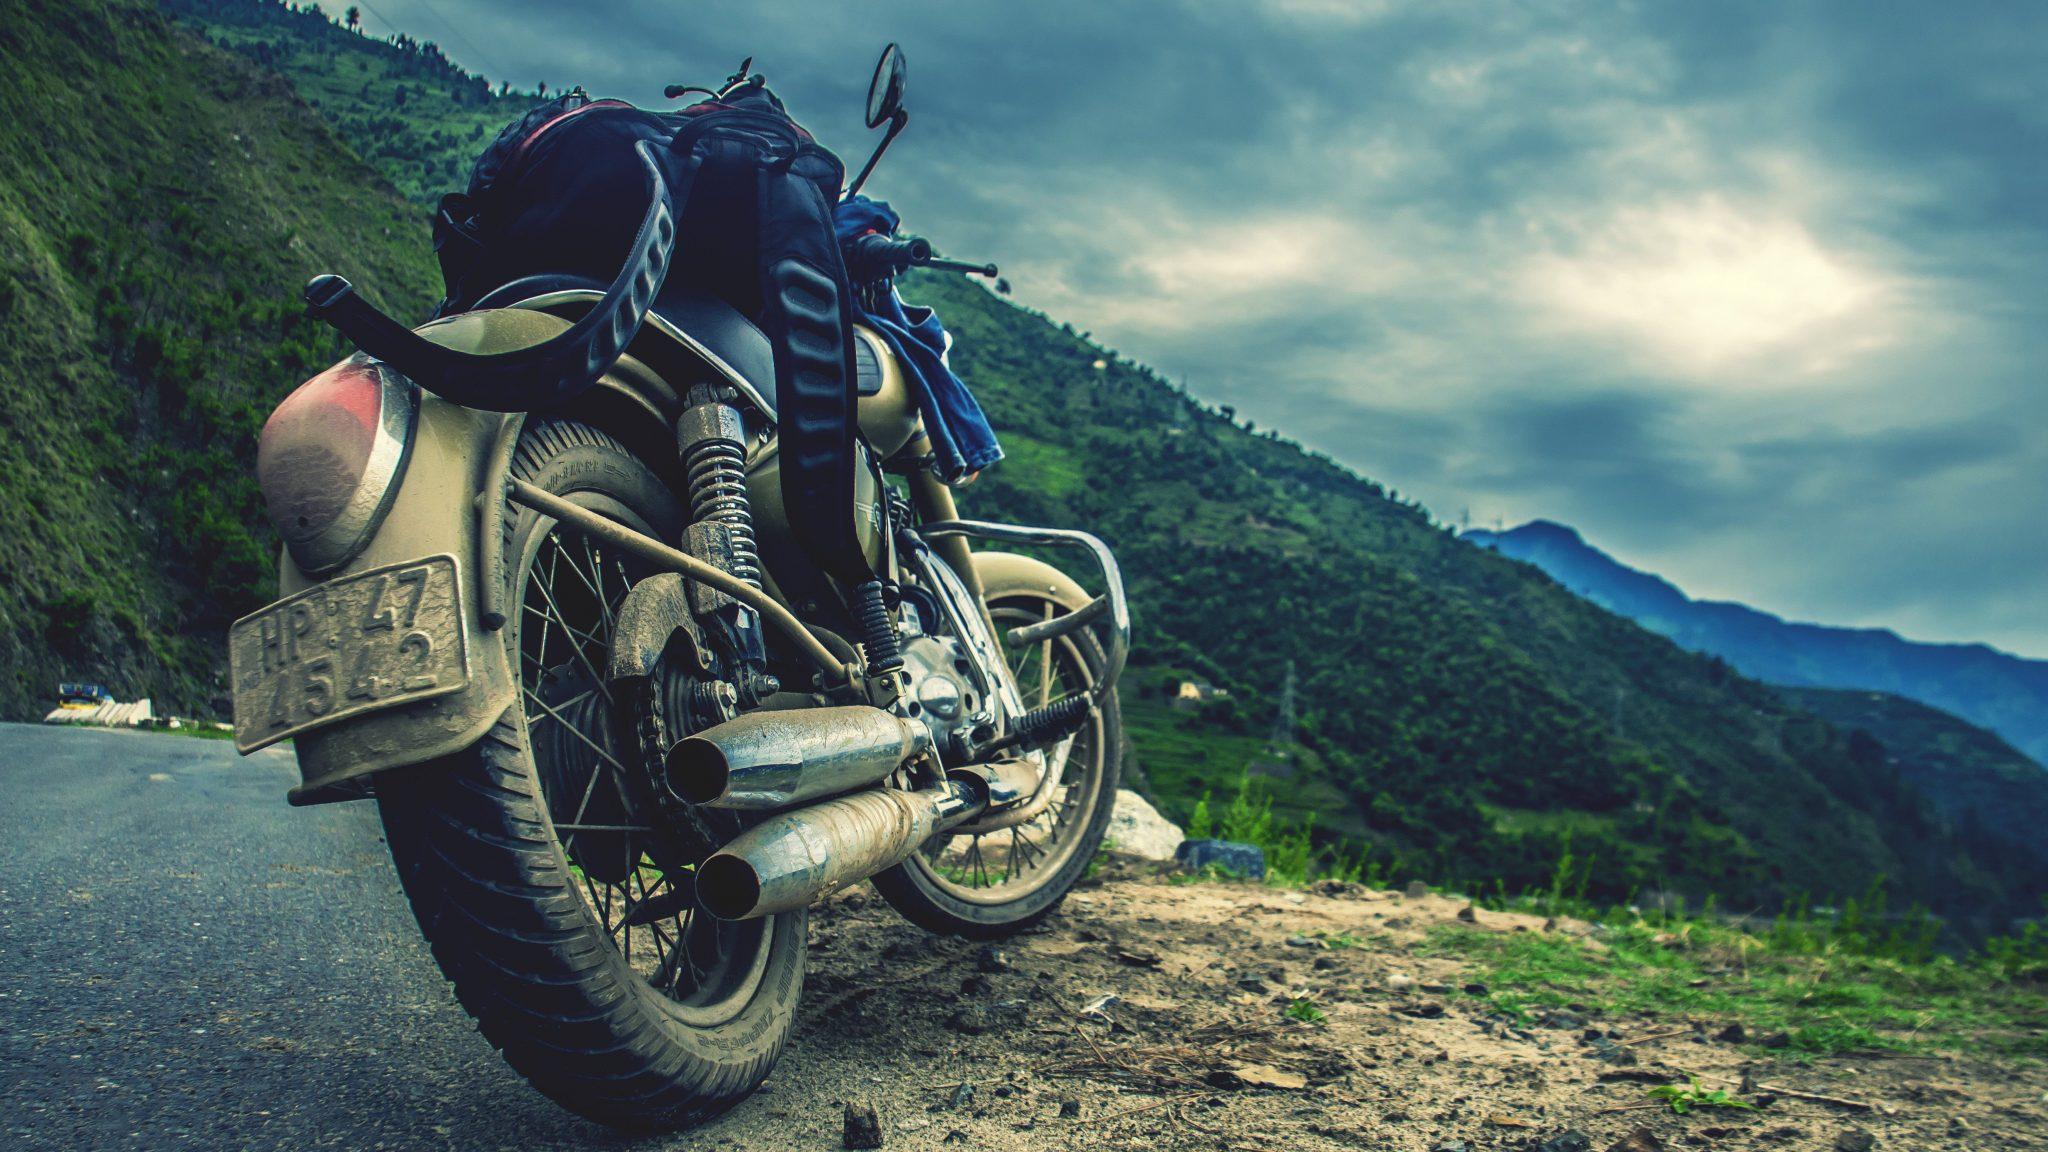 Bike Motorcycle 4k Wallpaper Best Wallpapers